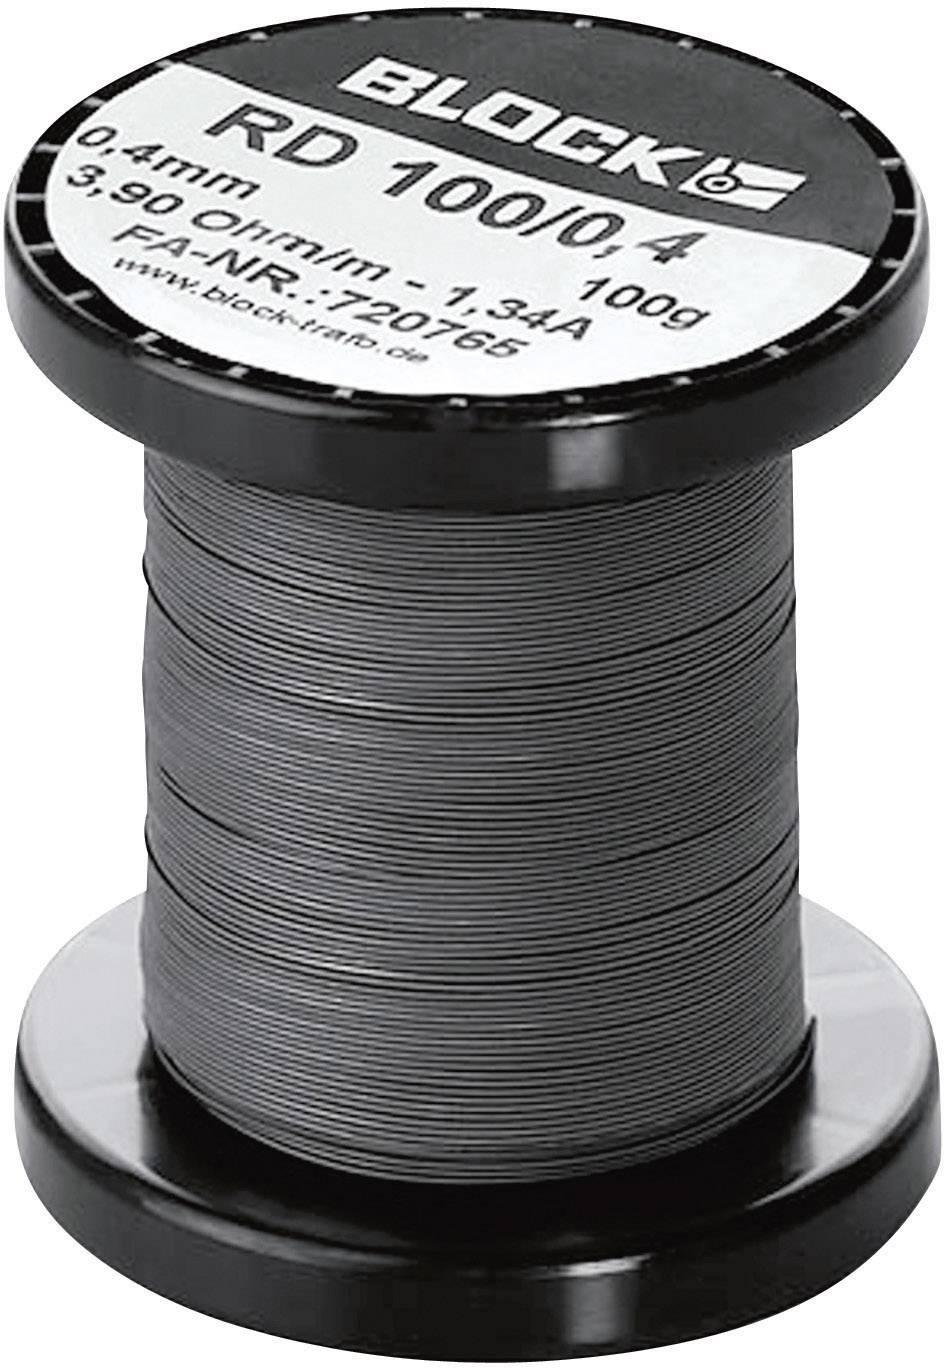 Odporový drát (konstantan) 6.93 Ω/m Block RD 100/0,3 158 m